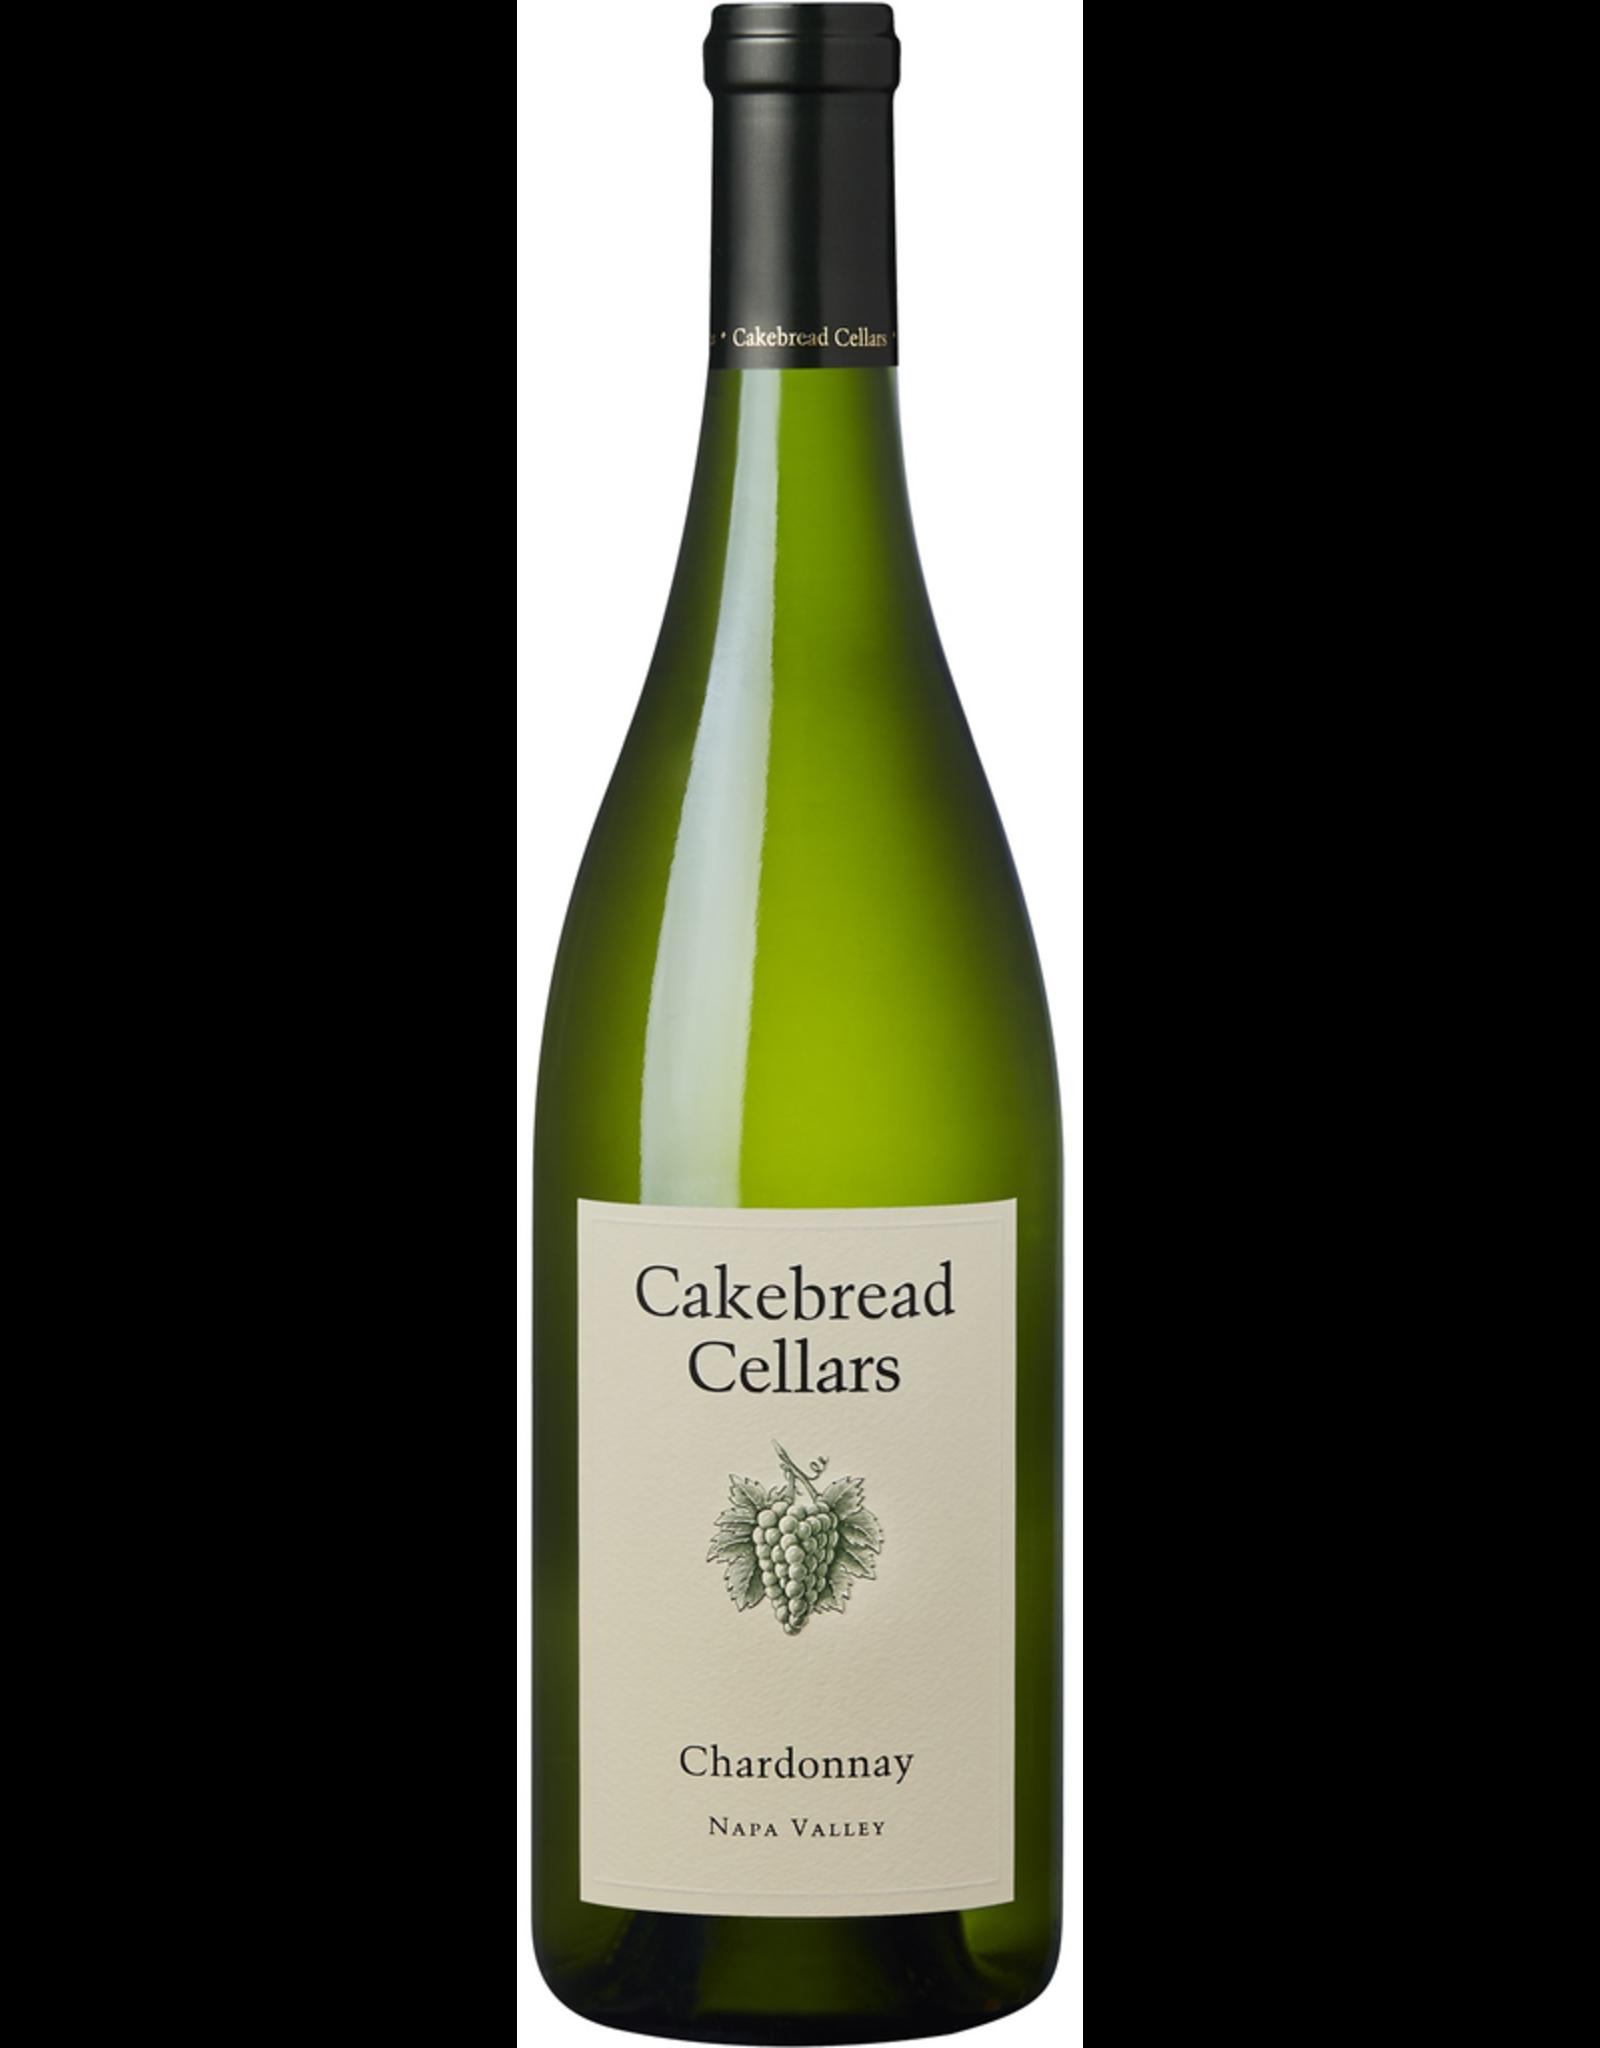 White Wine 2018, Cakebread Cellars, Chardonnay, Napa Valley, Napa, California, 13.7% Alc, CTnr, RP90